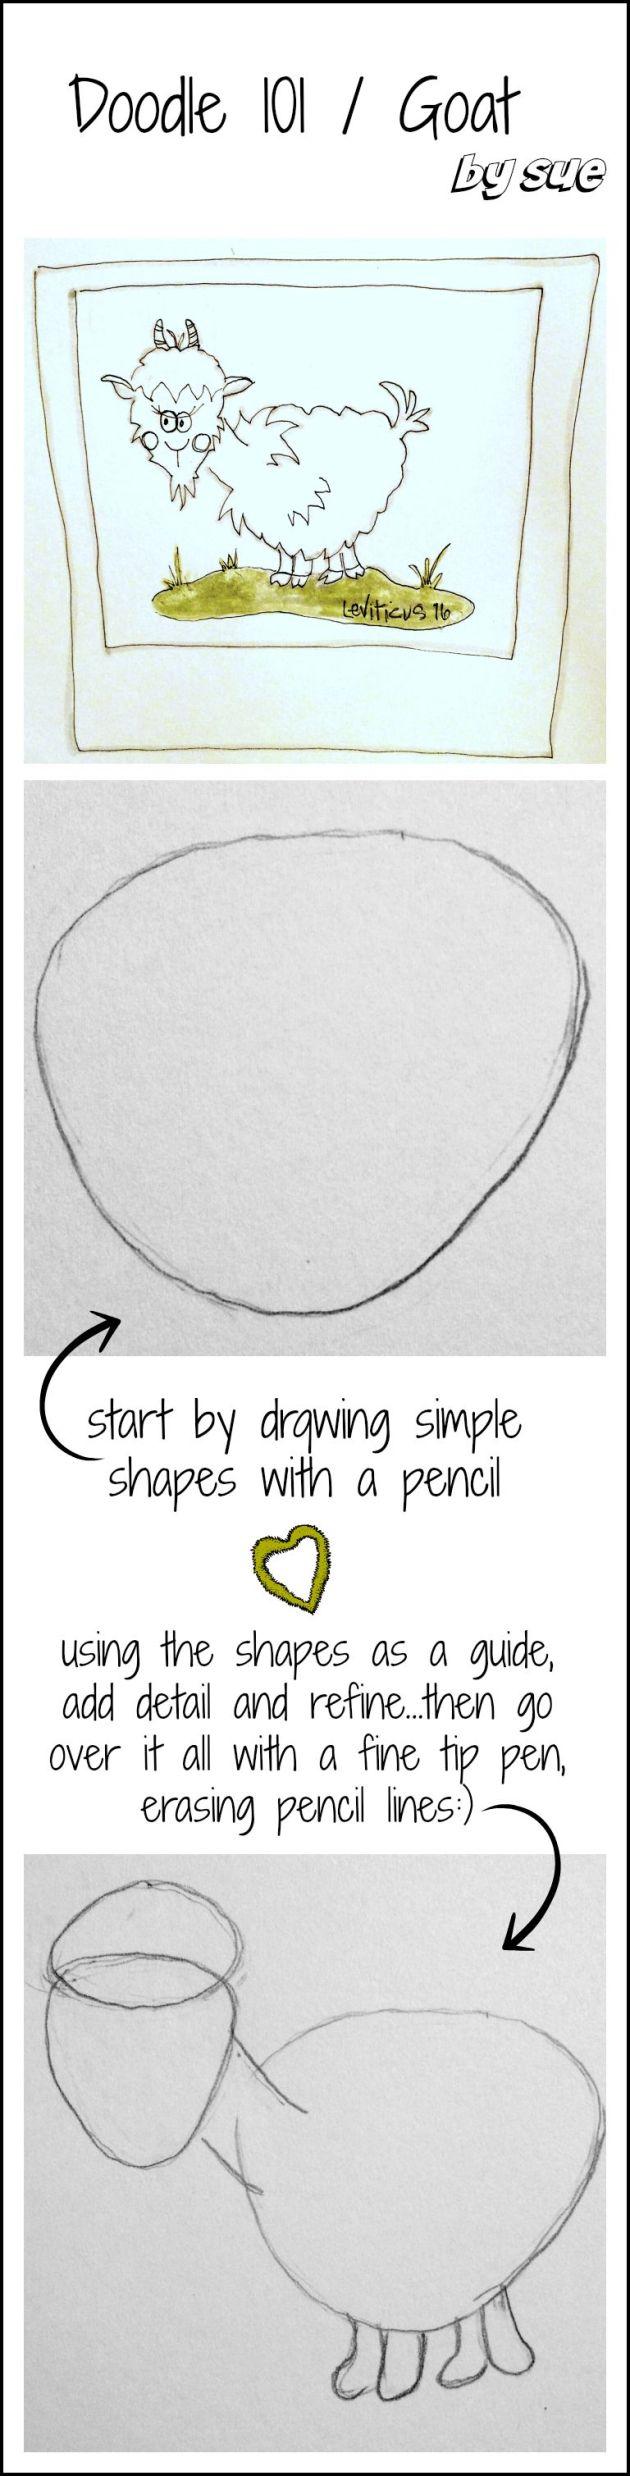 BAJ/ Doodle 101/ Goat / Sue Carroll